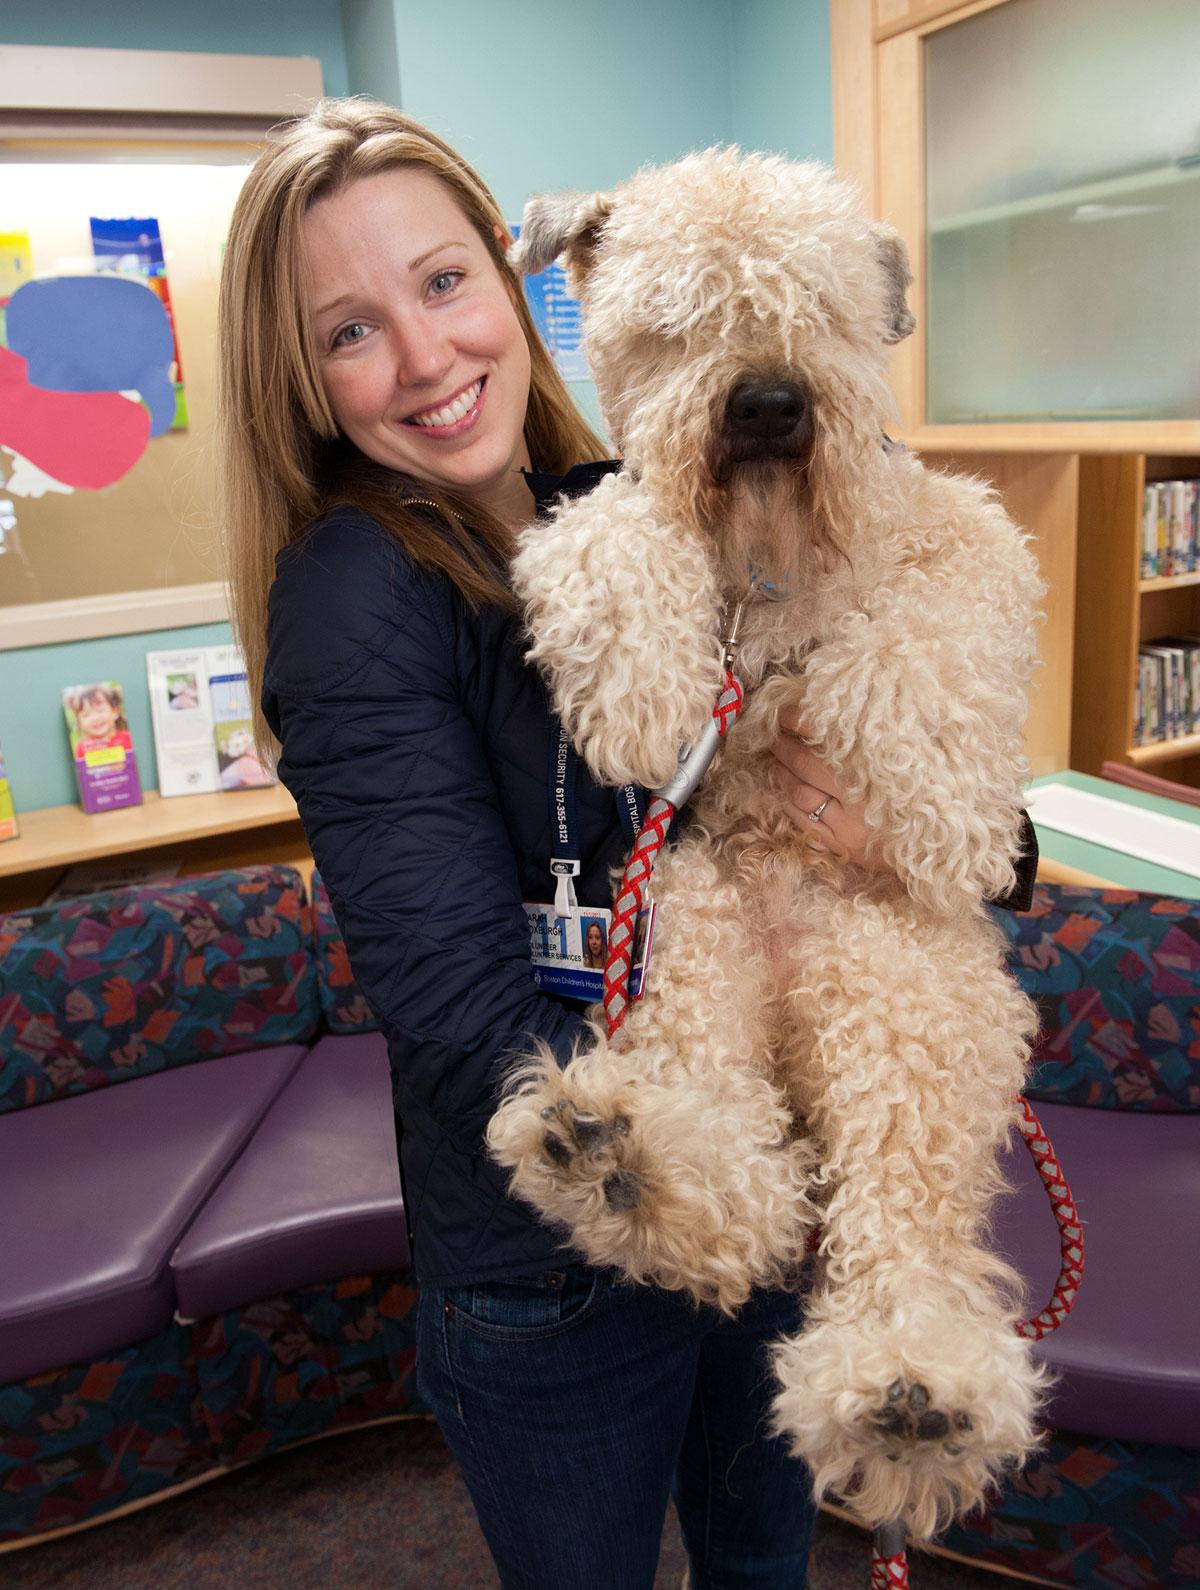 Pawprints dog Herman with handler Sarah